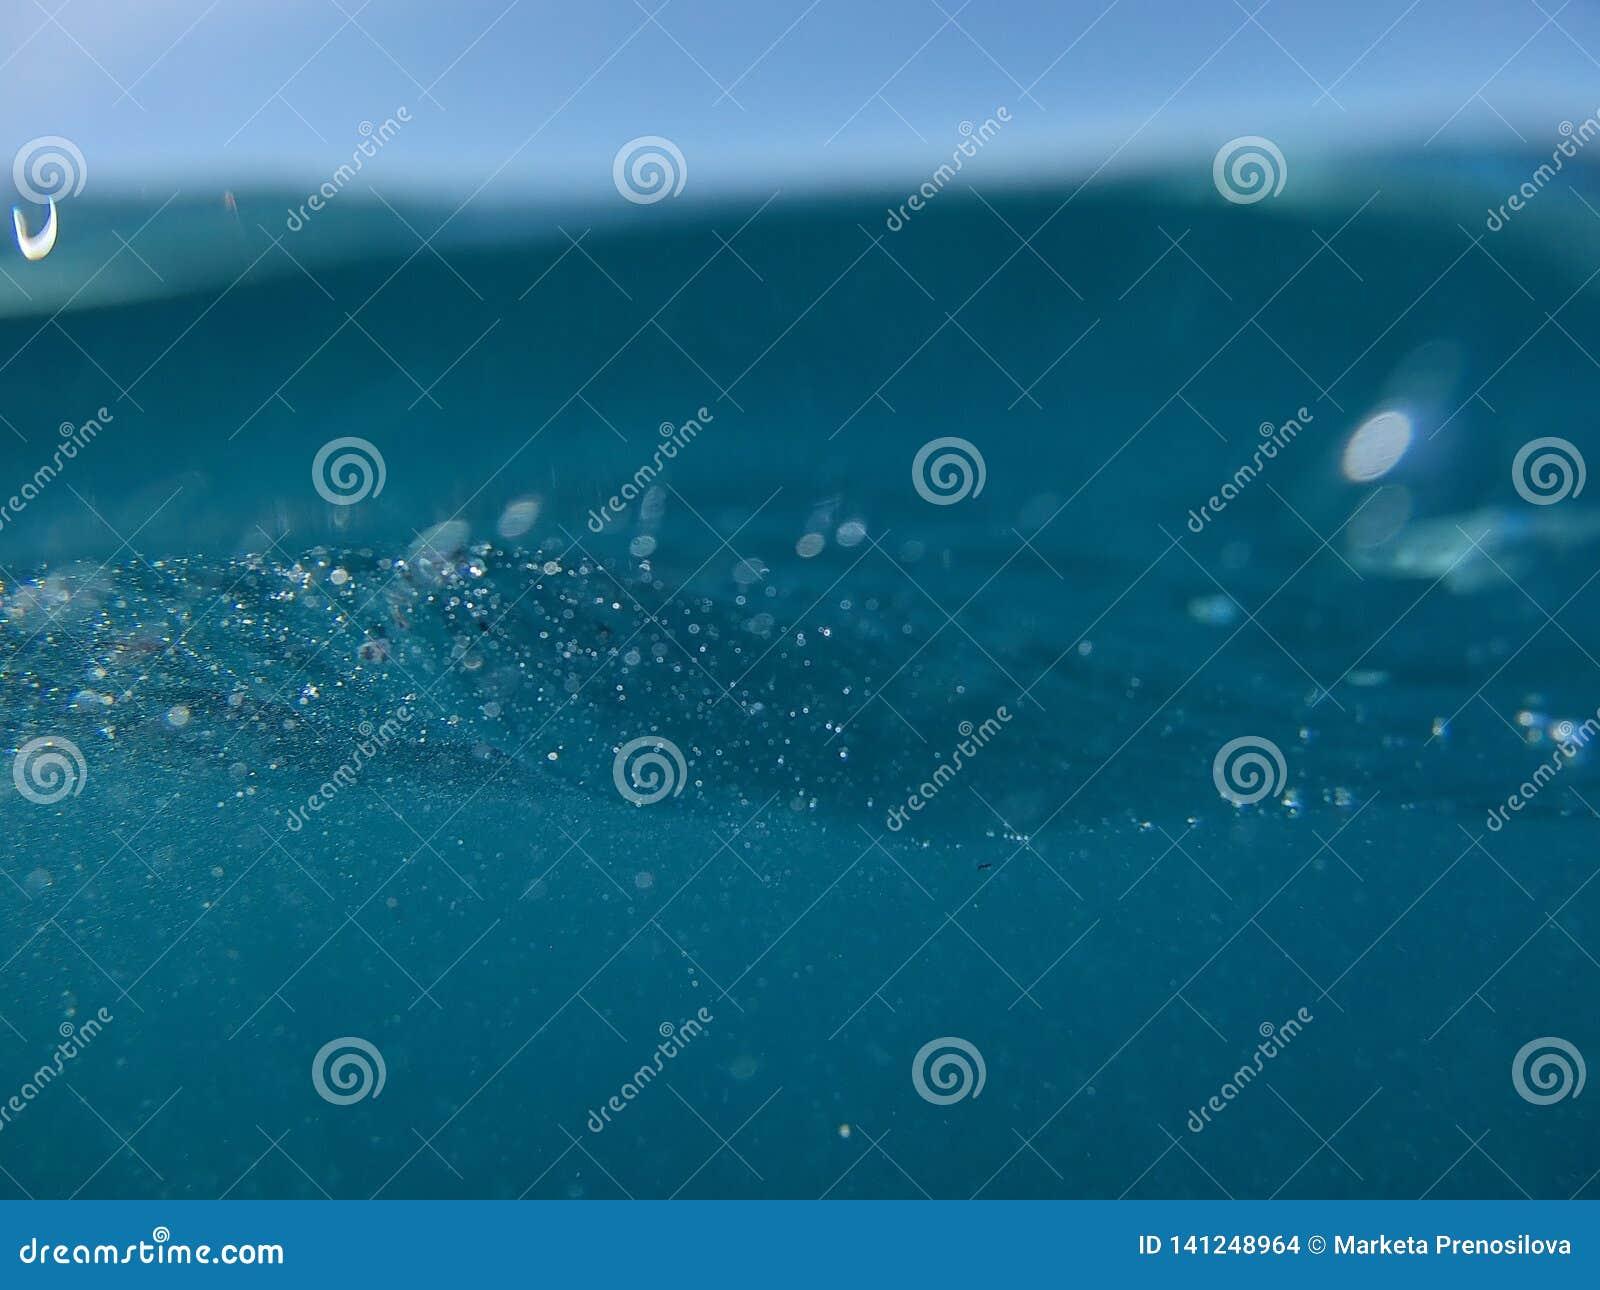 Reef, snorkeling, different world, diving, ocean